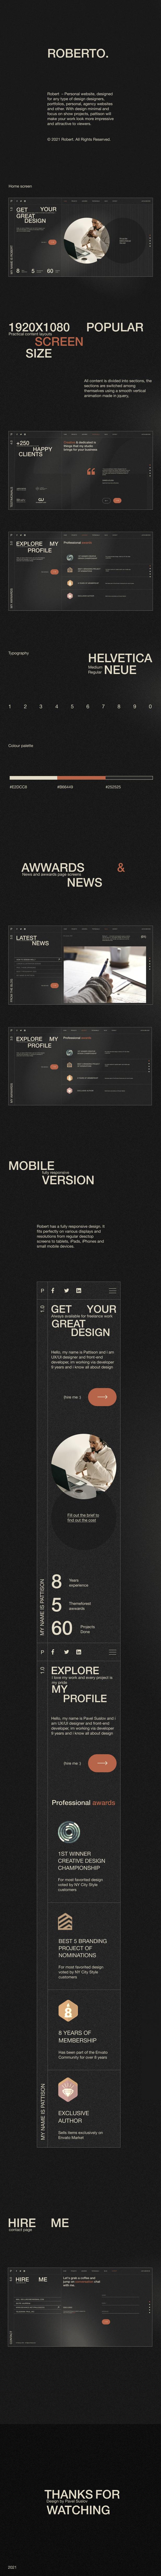 Roberto. - Onepage Horizontal Personal CV/Resume HTML Template - 4